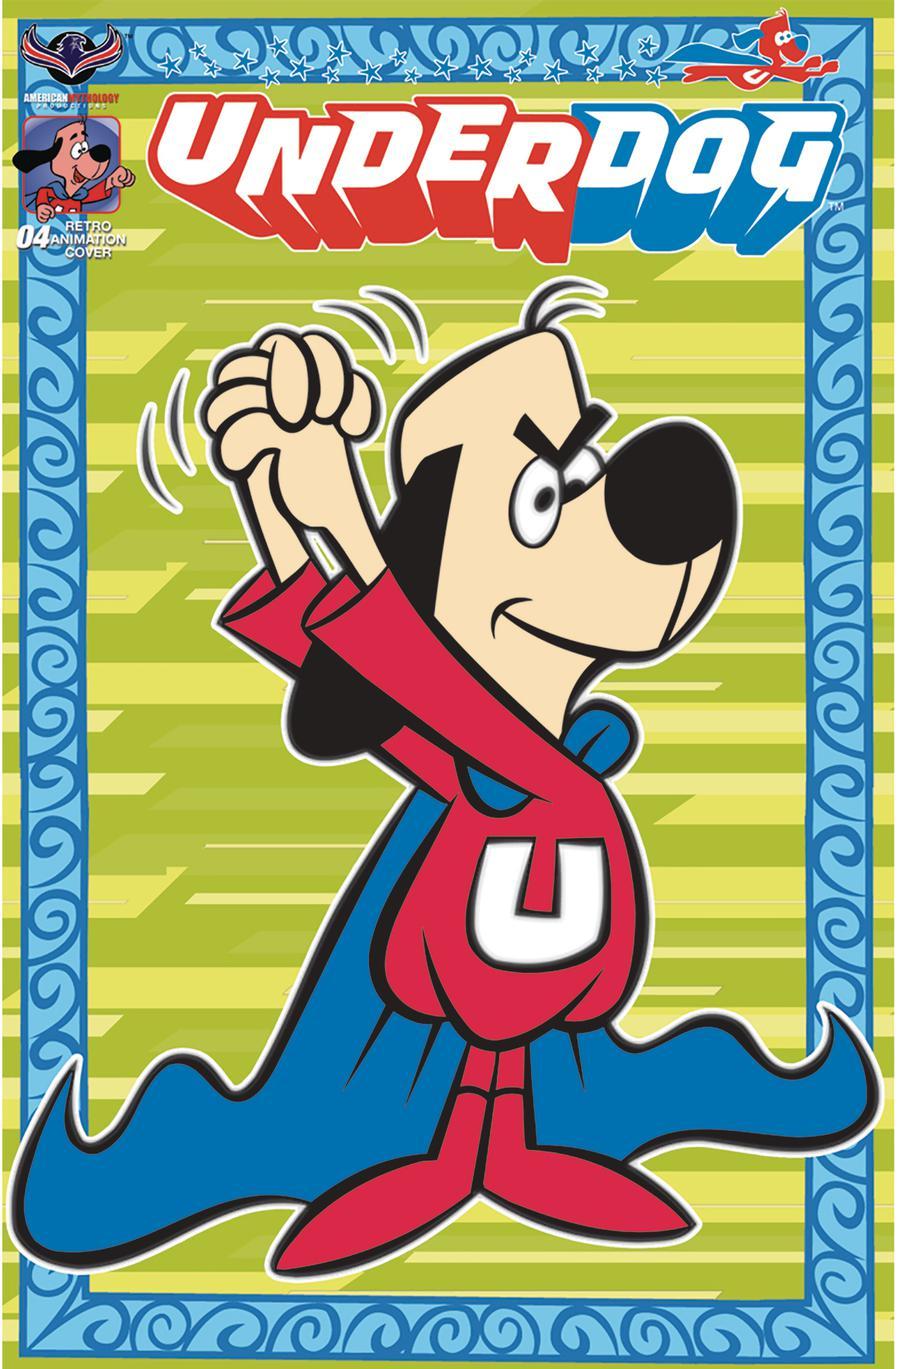 Underdog (American Mythology) #4 Cover C Variant Retro Animation Limited Edition Cover